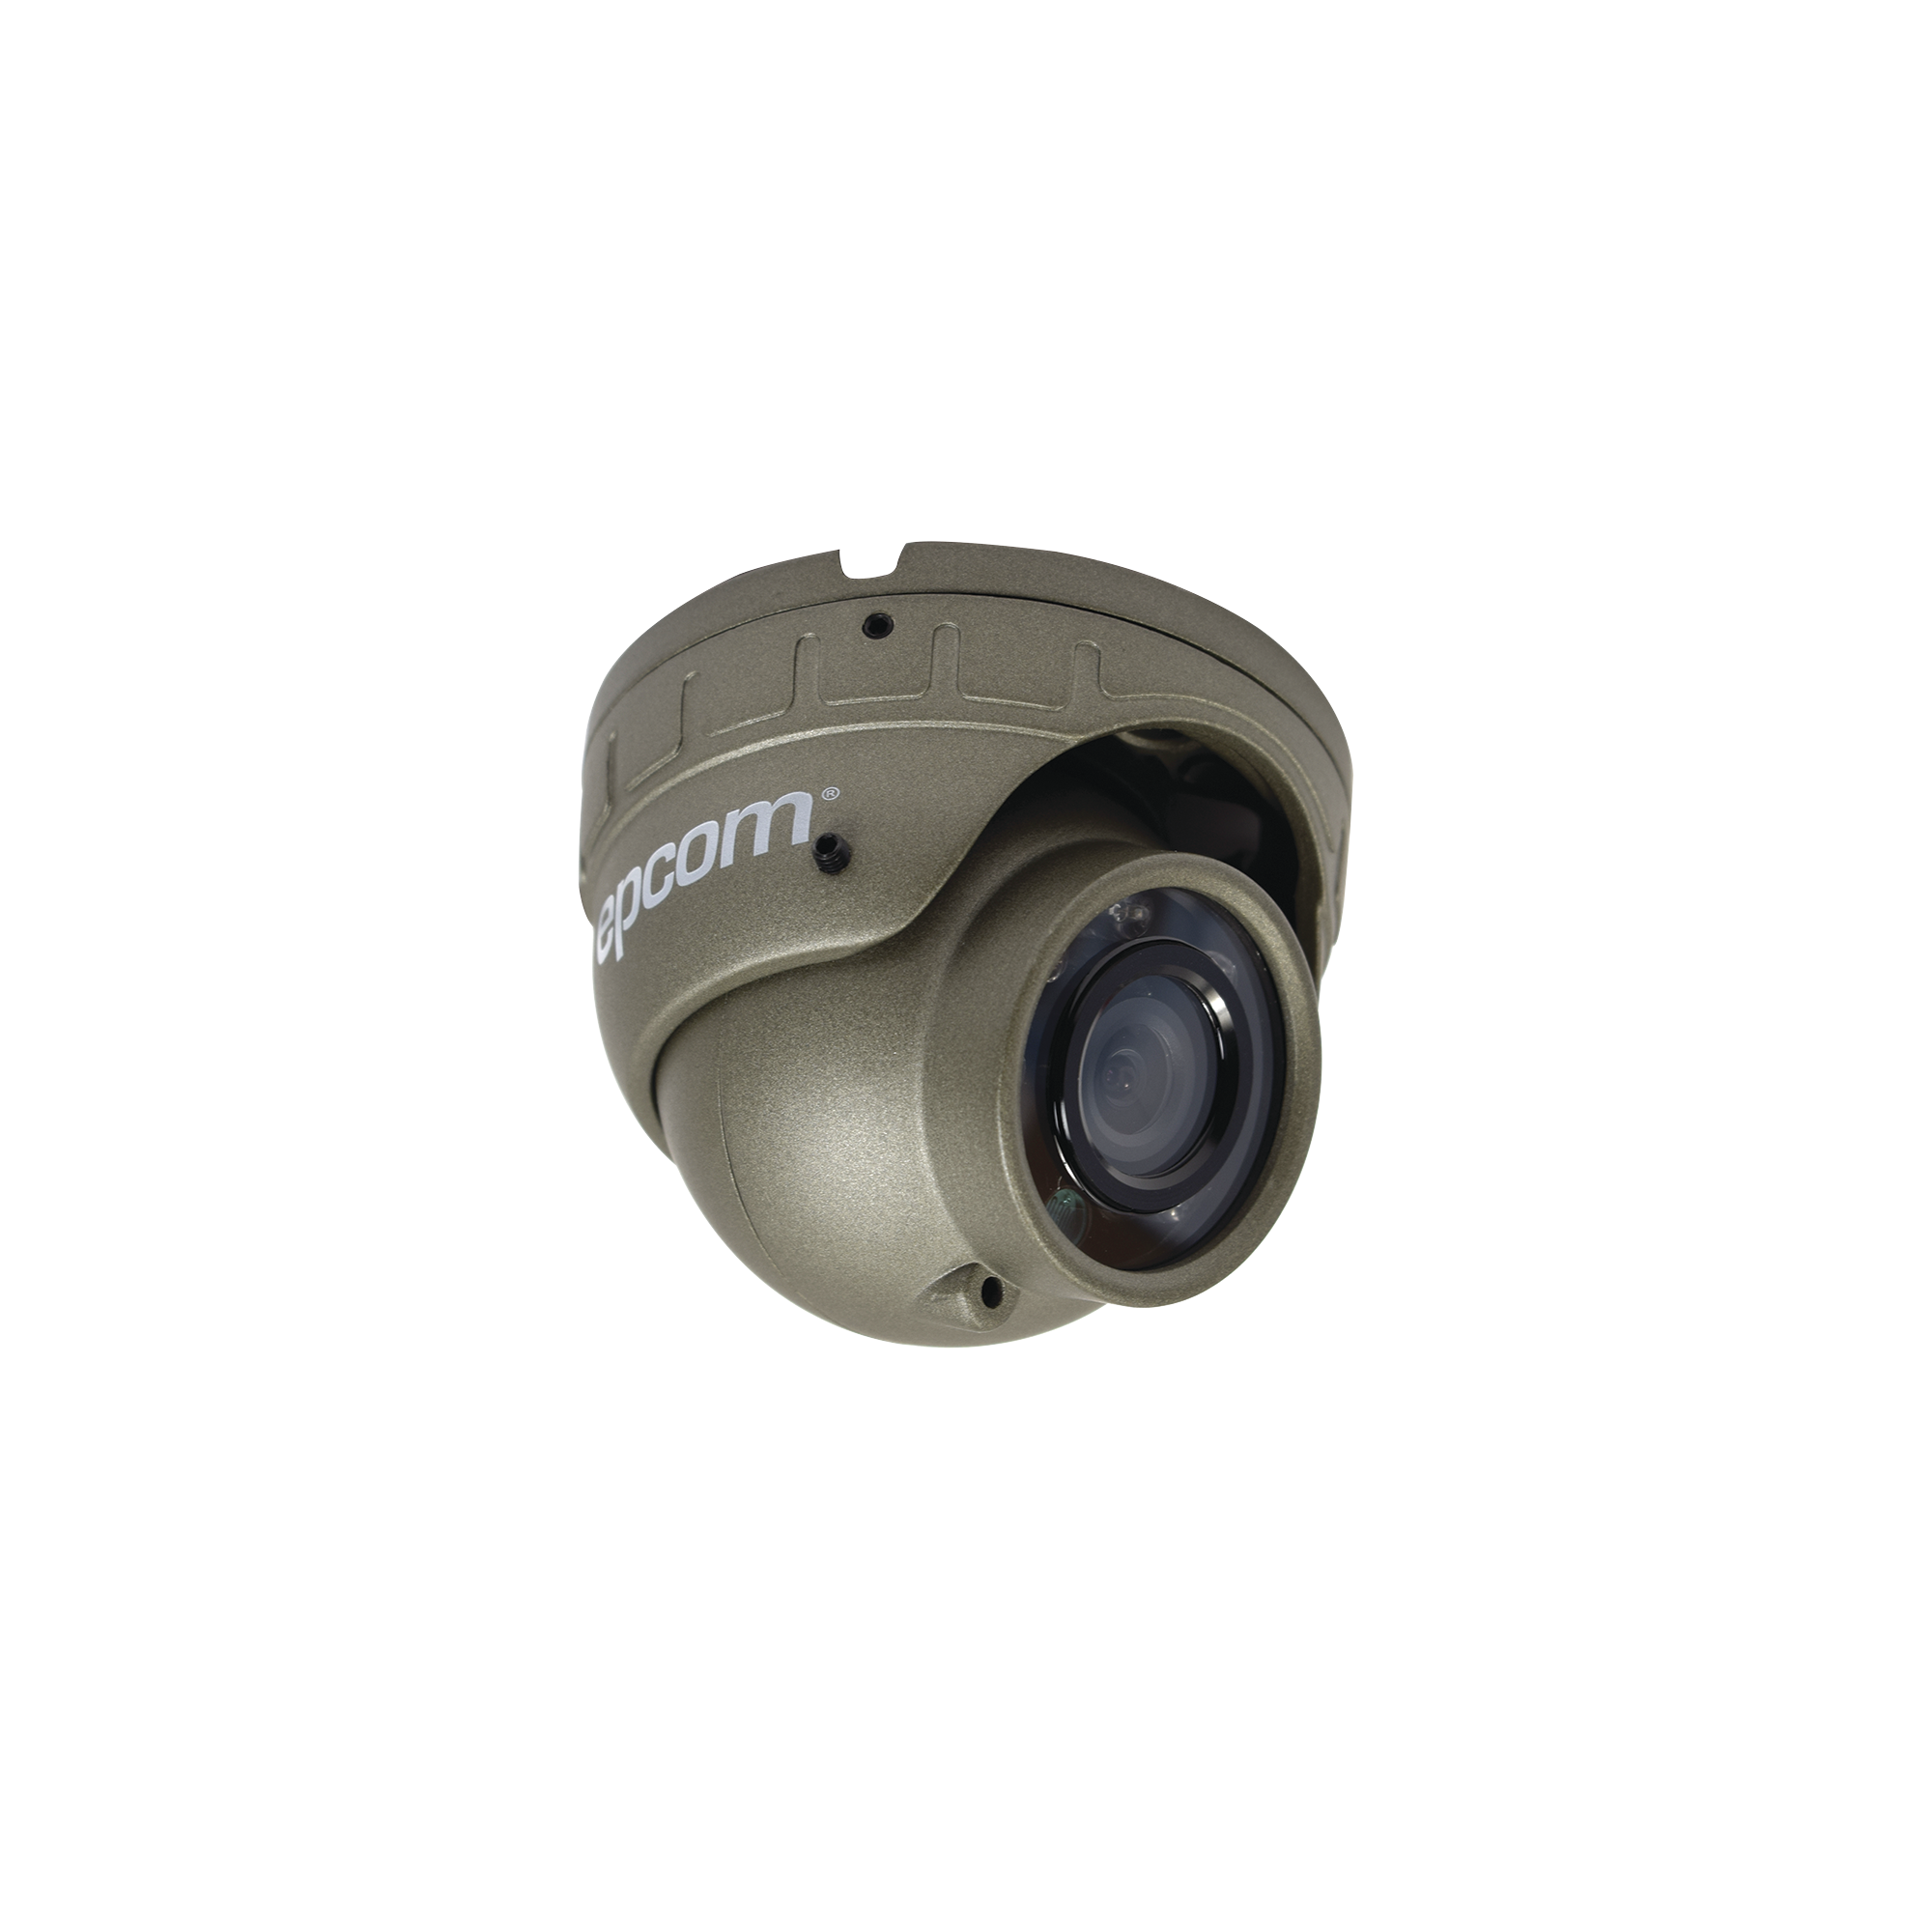 Domo Analógico 800TVL, Antivandálico 3.6 mm con micrófono compatible con DVRs móviles XMR EPCOM Series